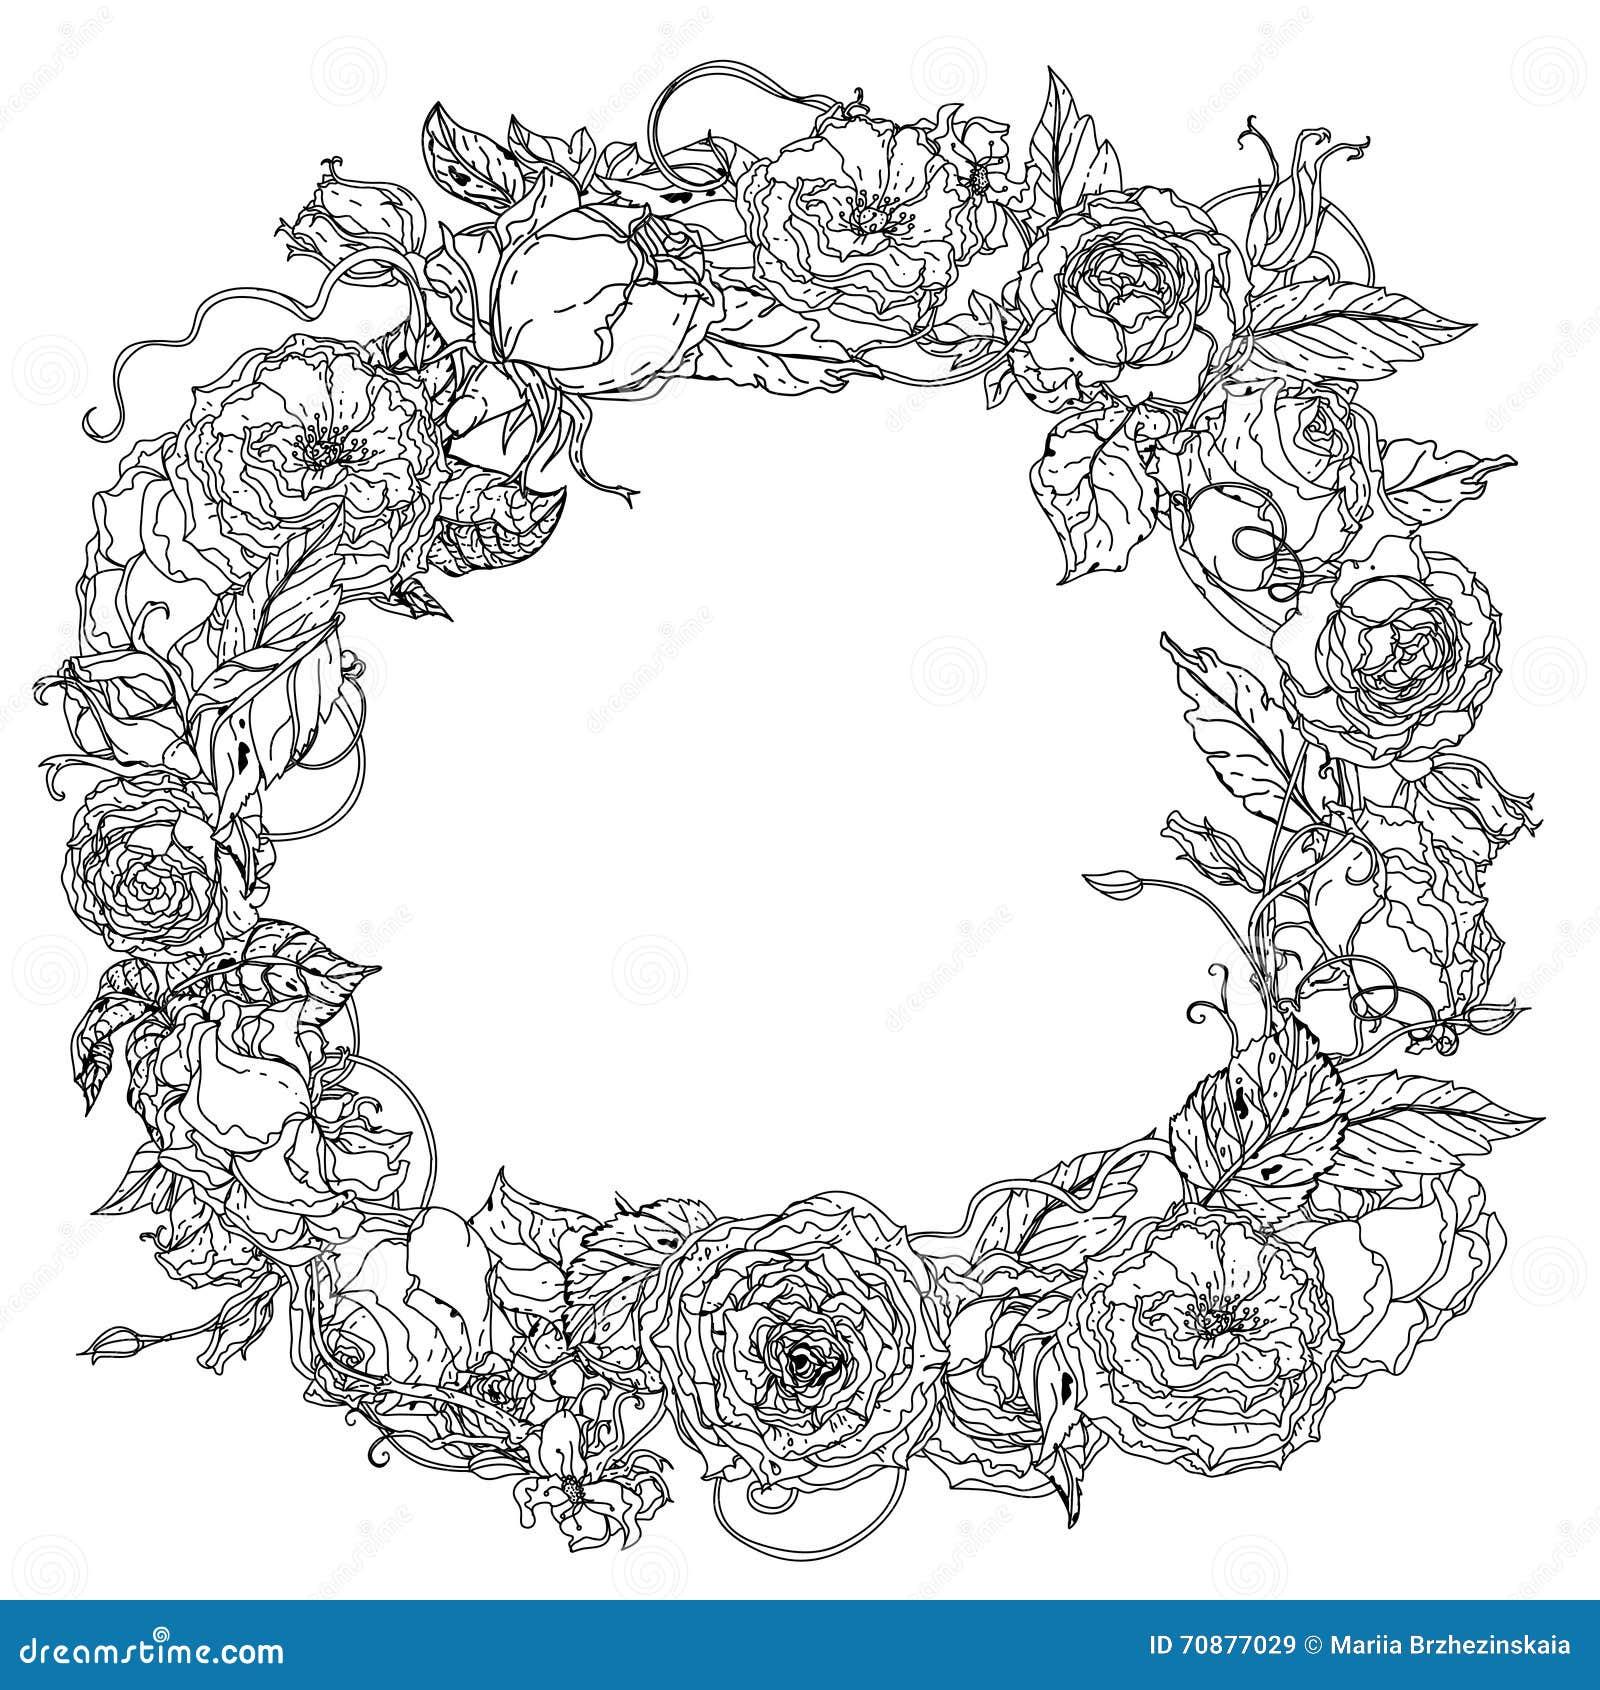 Coloriage Guirlande Fleurs.Guirlande De Dessin De Main Noire Et Blanche Mandala De